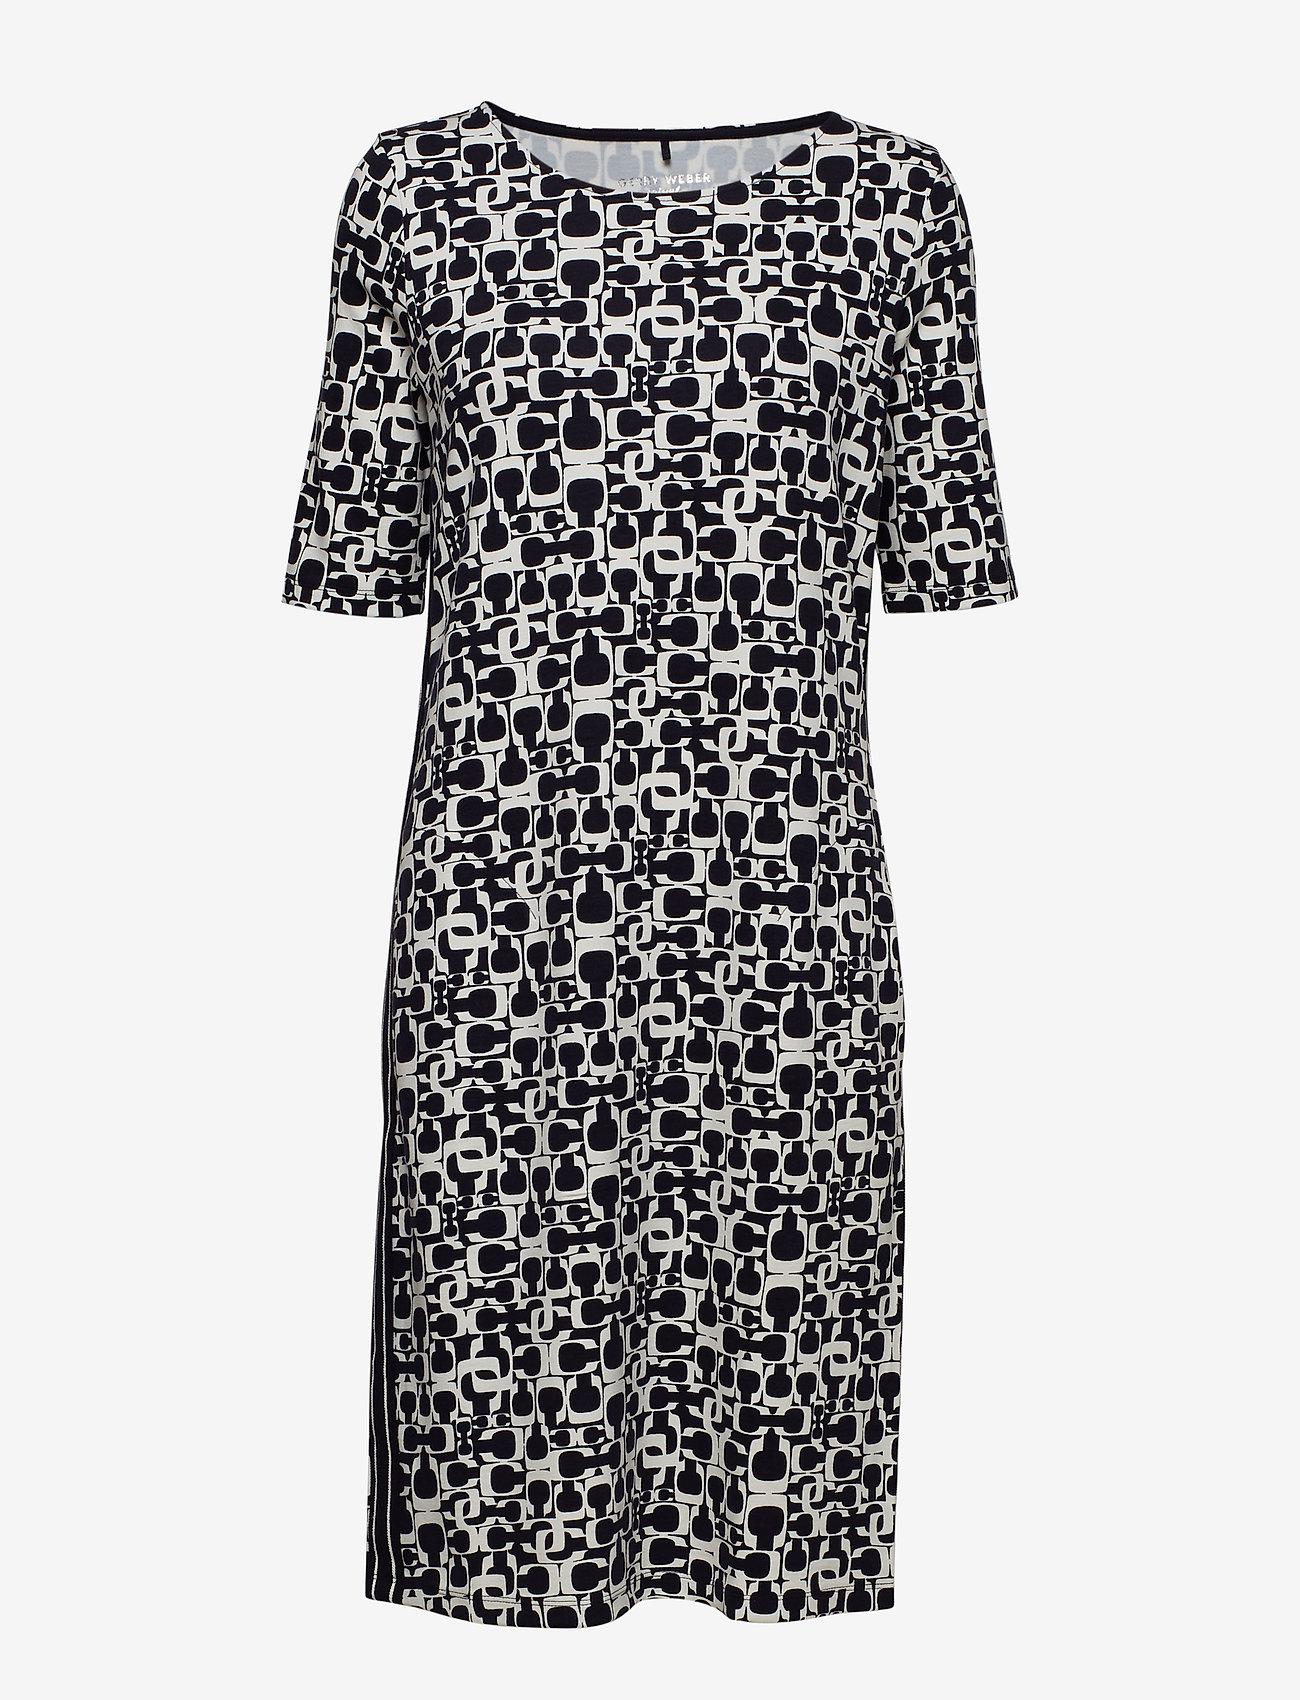 Gerry Weber Edition - DRESS KNITTED FABRIC - midi dresses - blue/ecru/white print